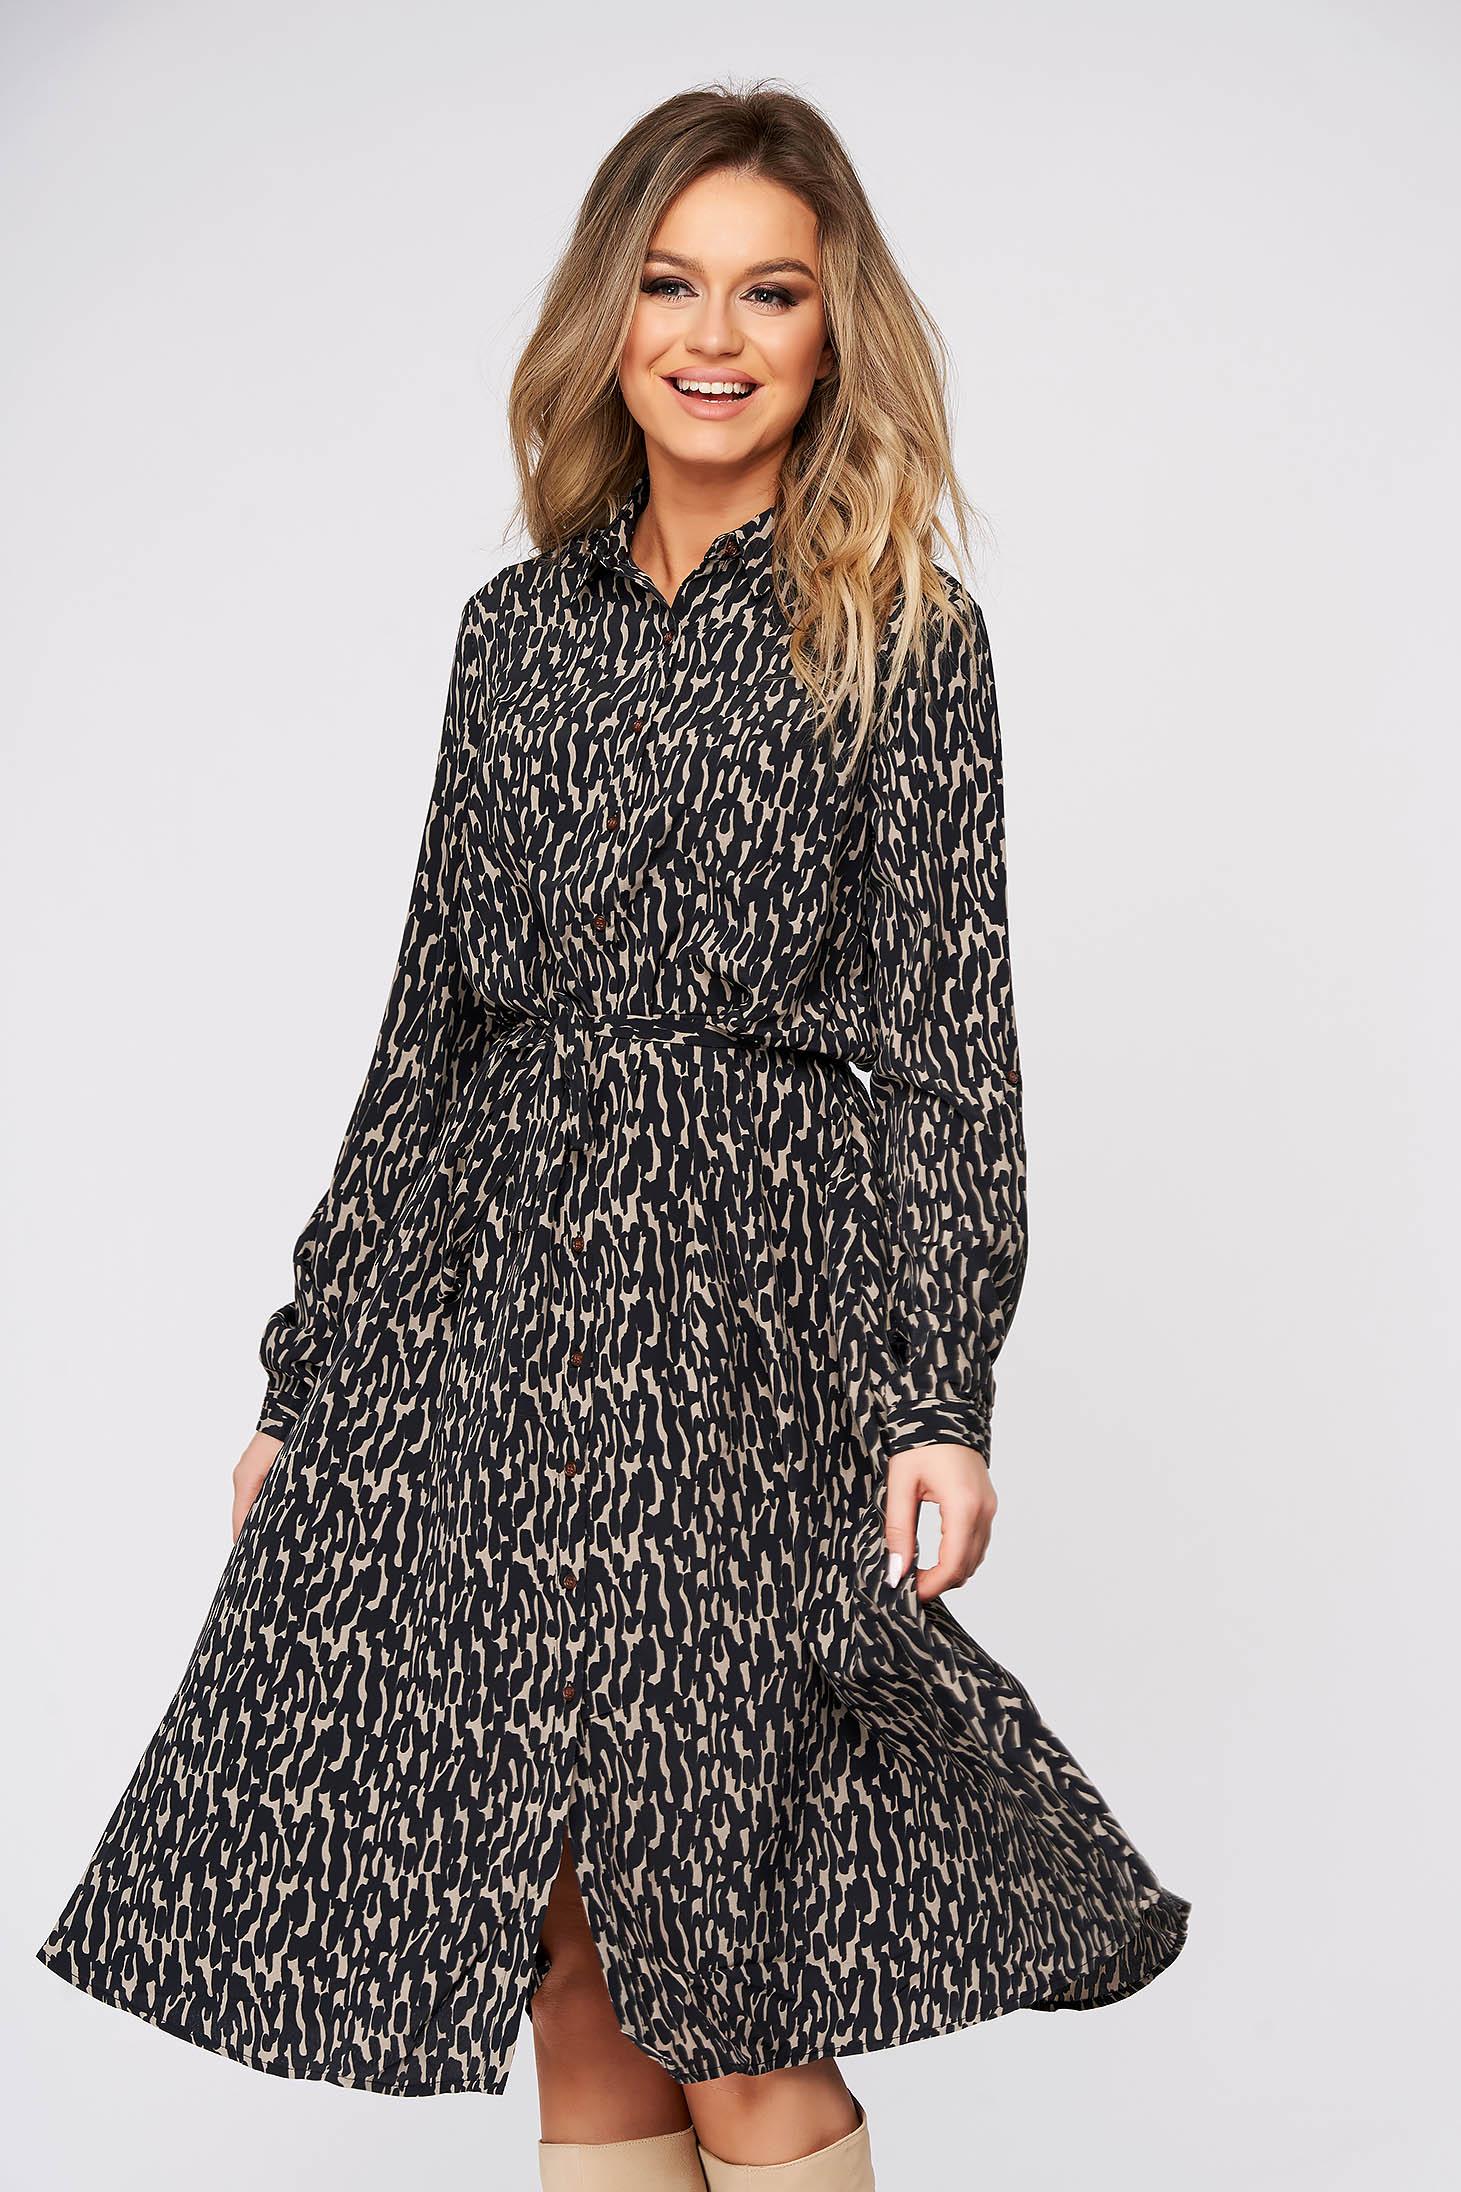 Black dress daily cloche midi long sleeved thin fabric